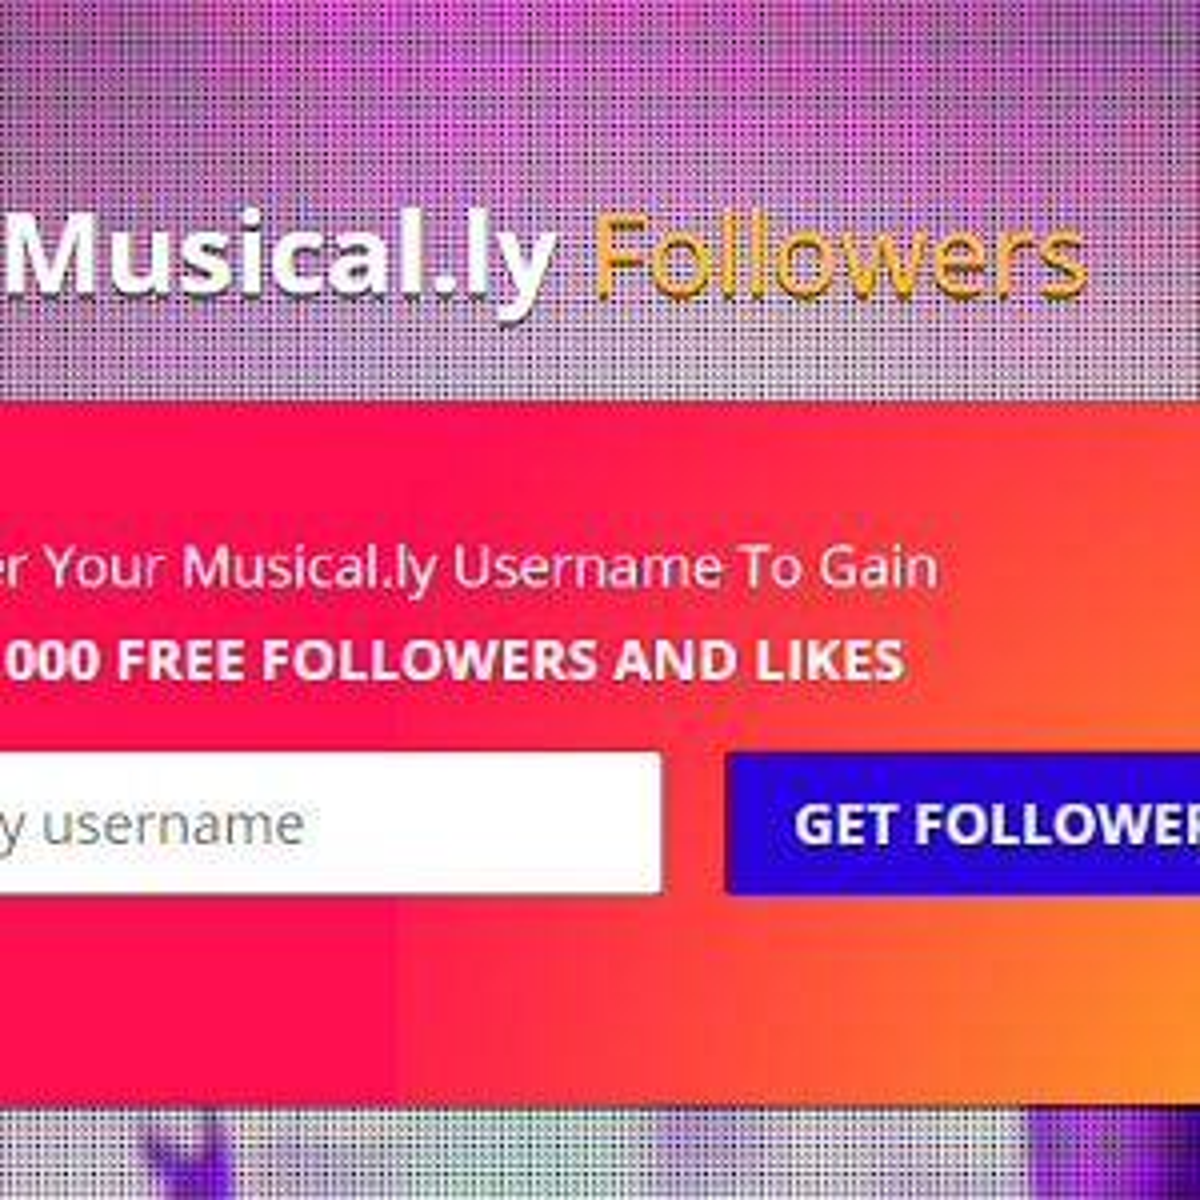 10.000 Musically Followers